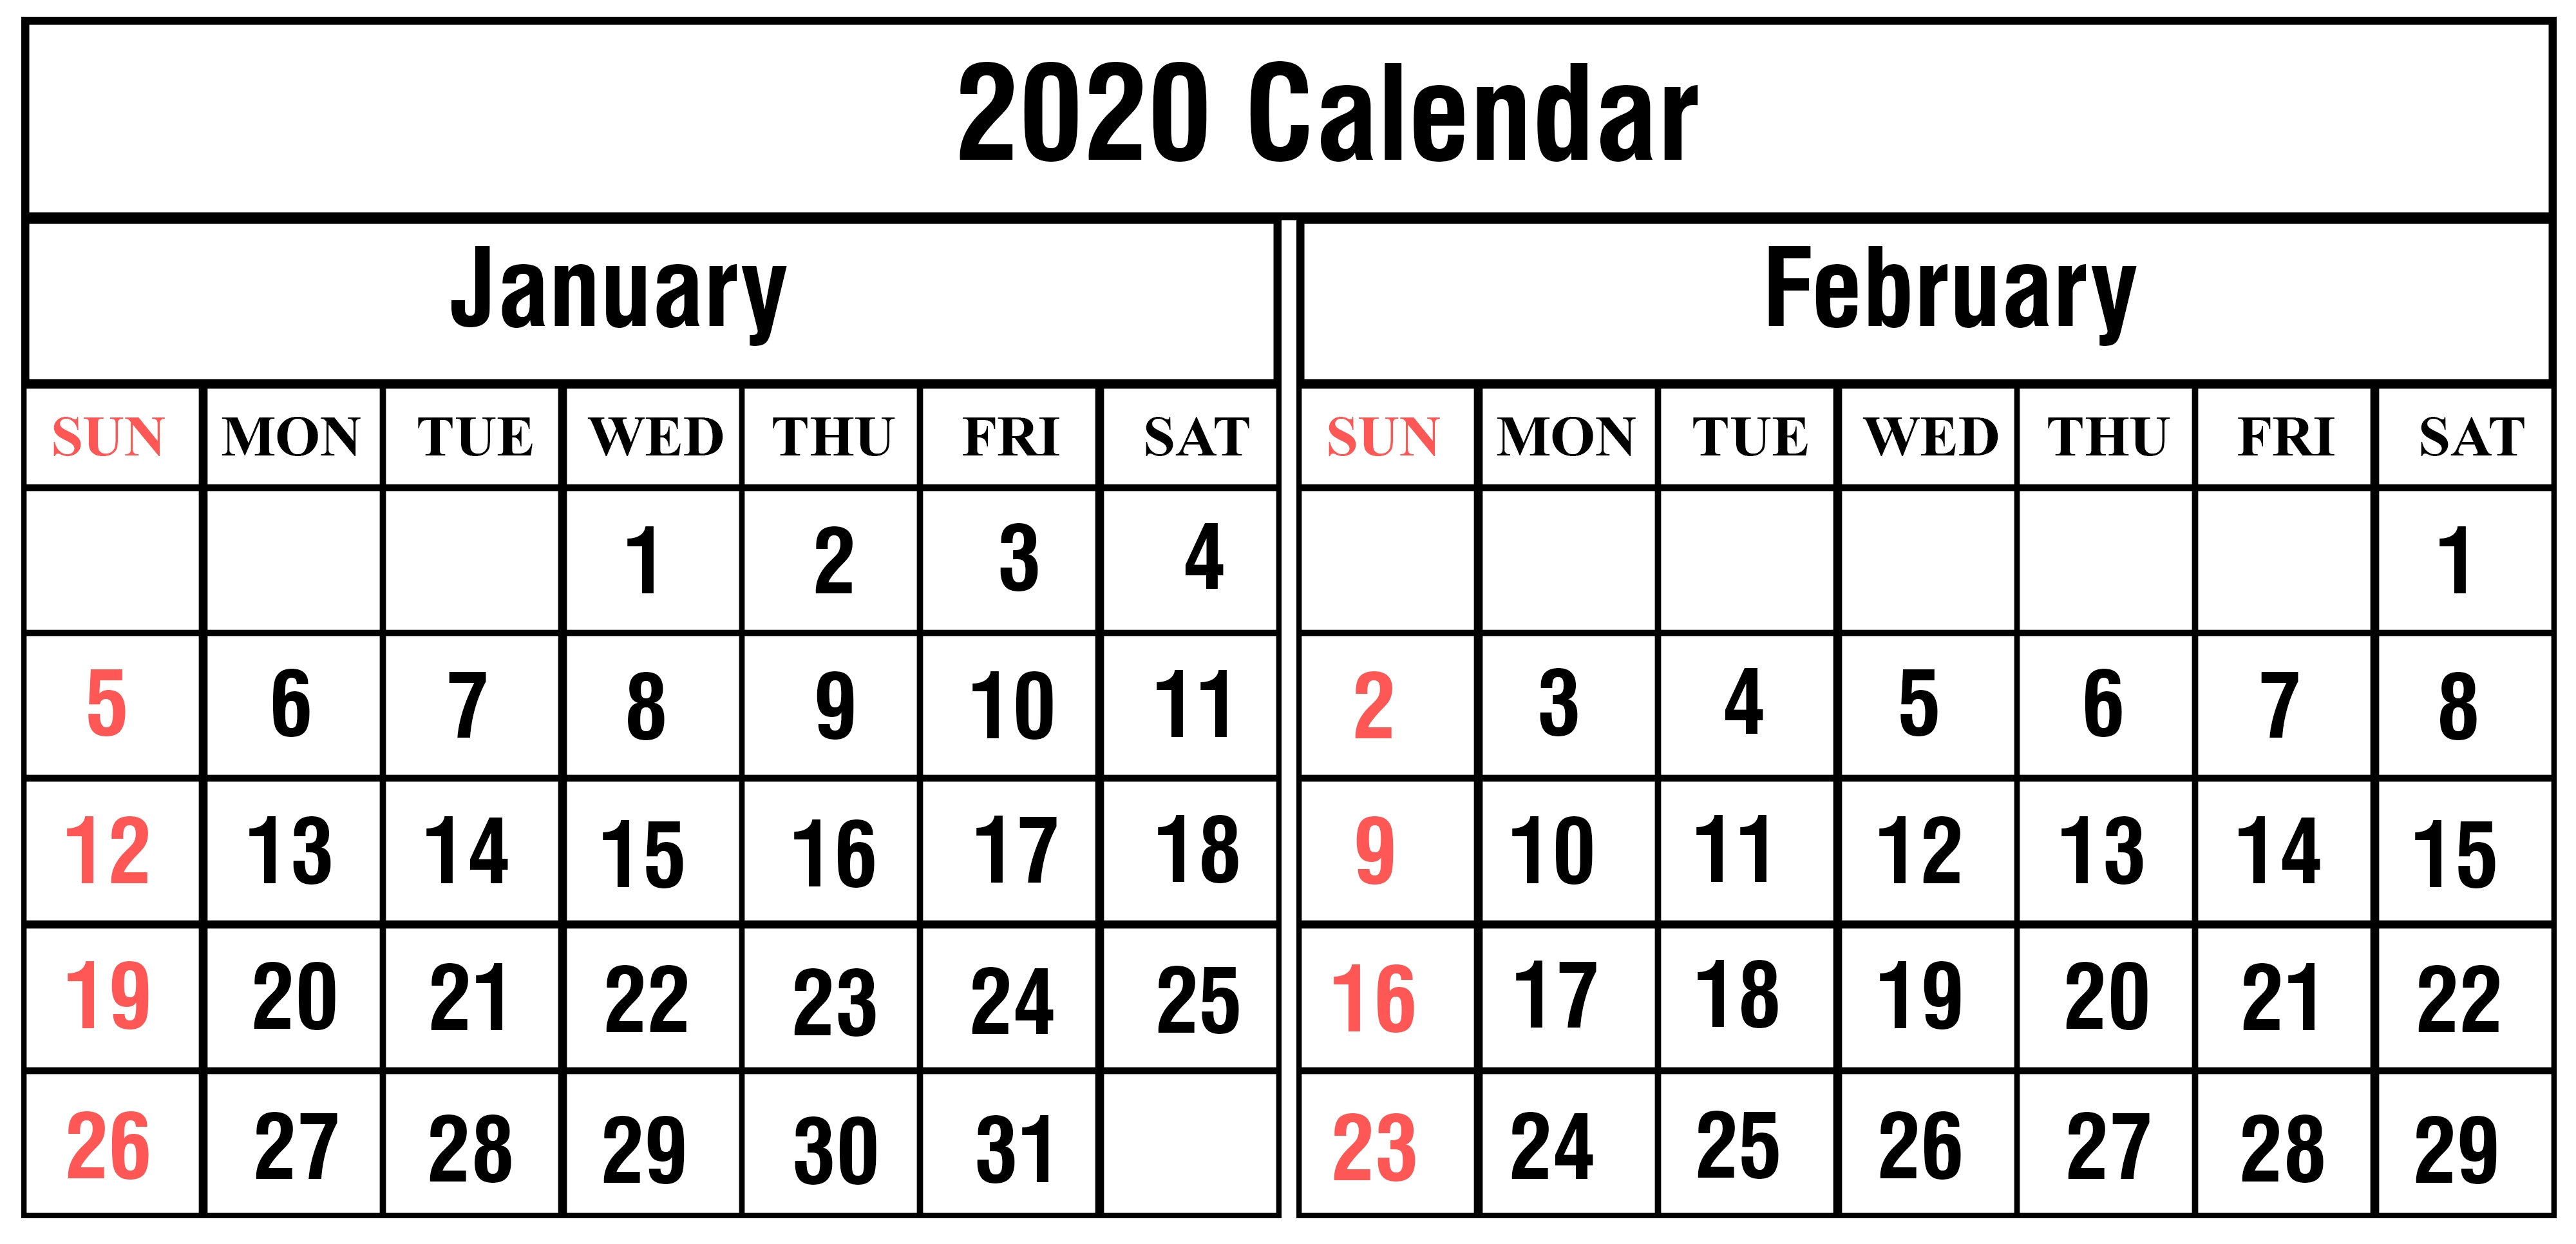 Free January & February 2020 Printable Calendar Templates-January 2020 Calendar Events